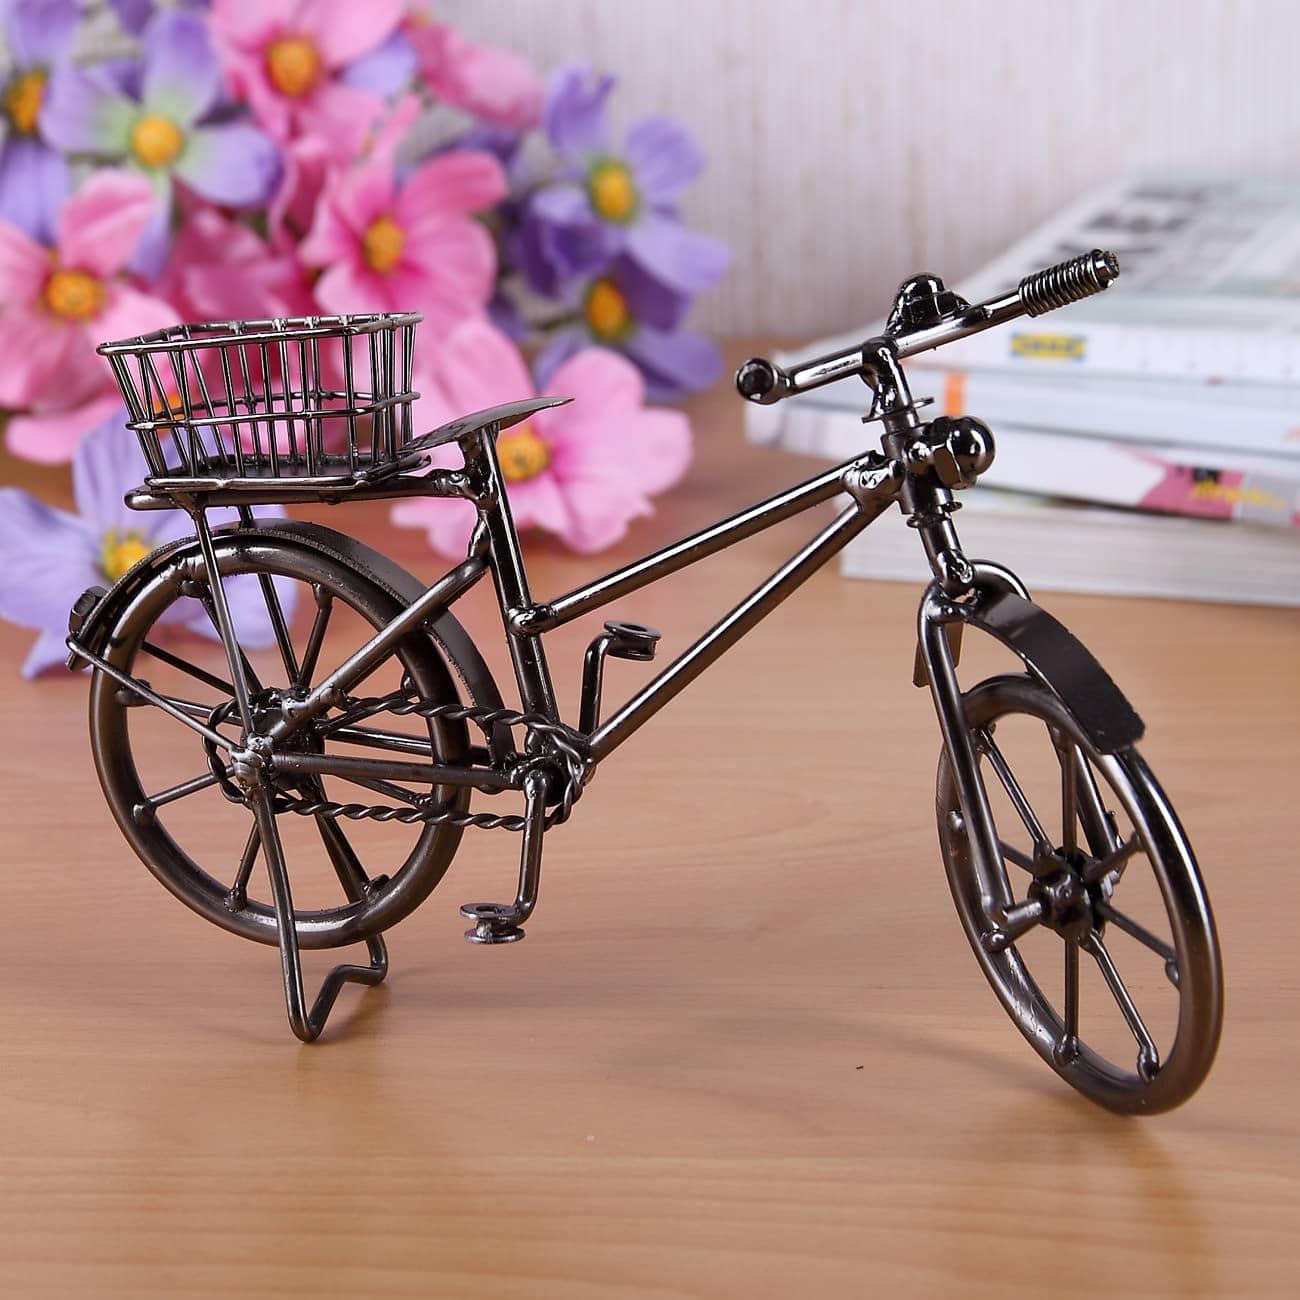 Deko fahrrad mit korb aus metall geschenke for Korb deko